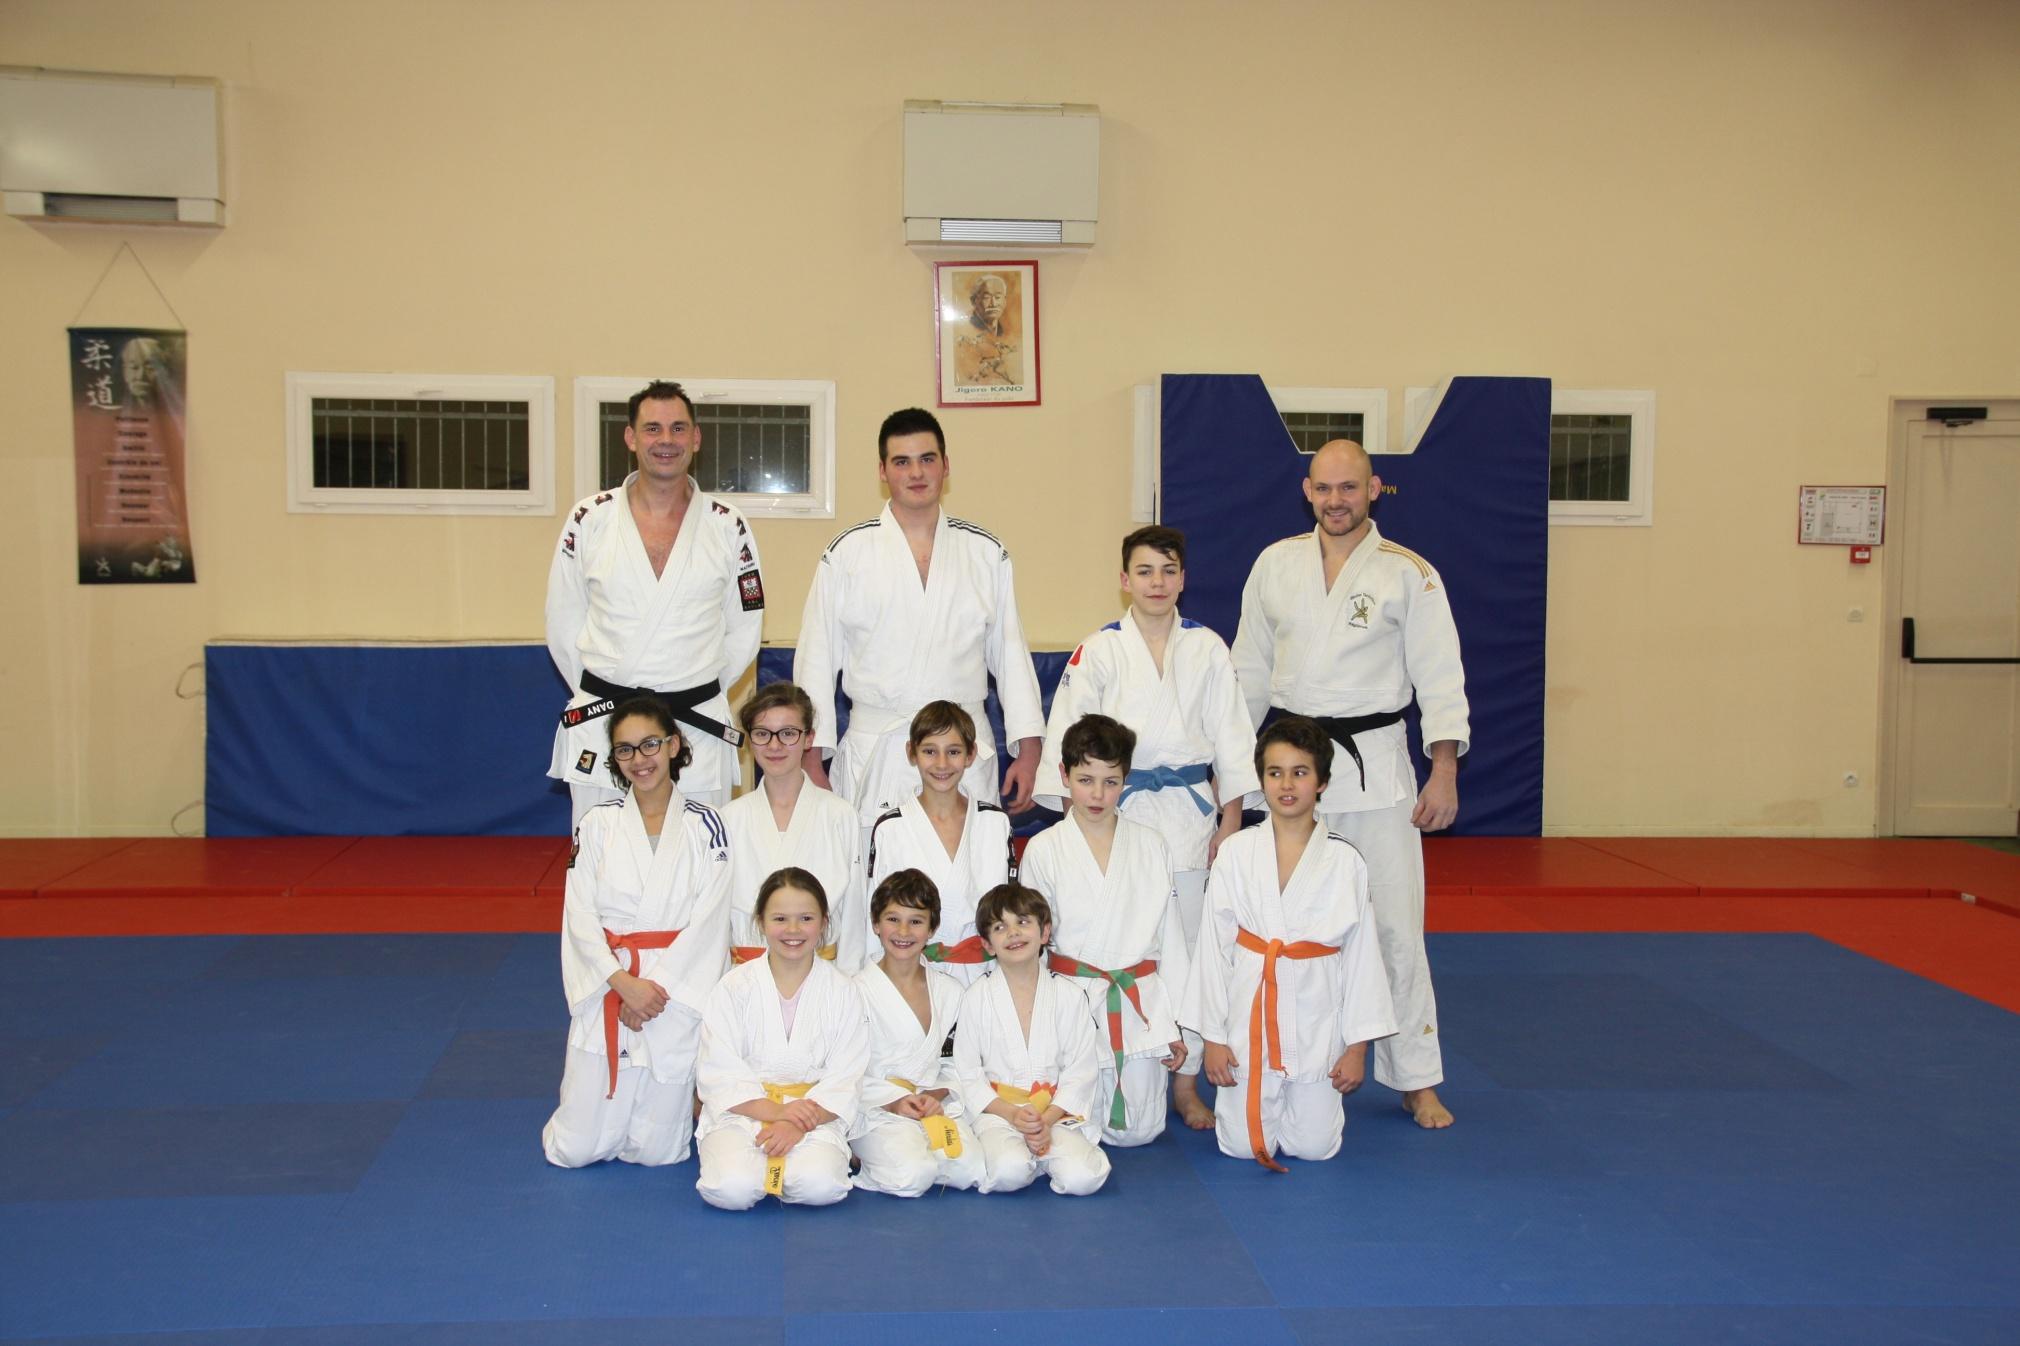 Judokas Quentin